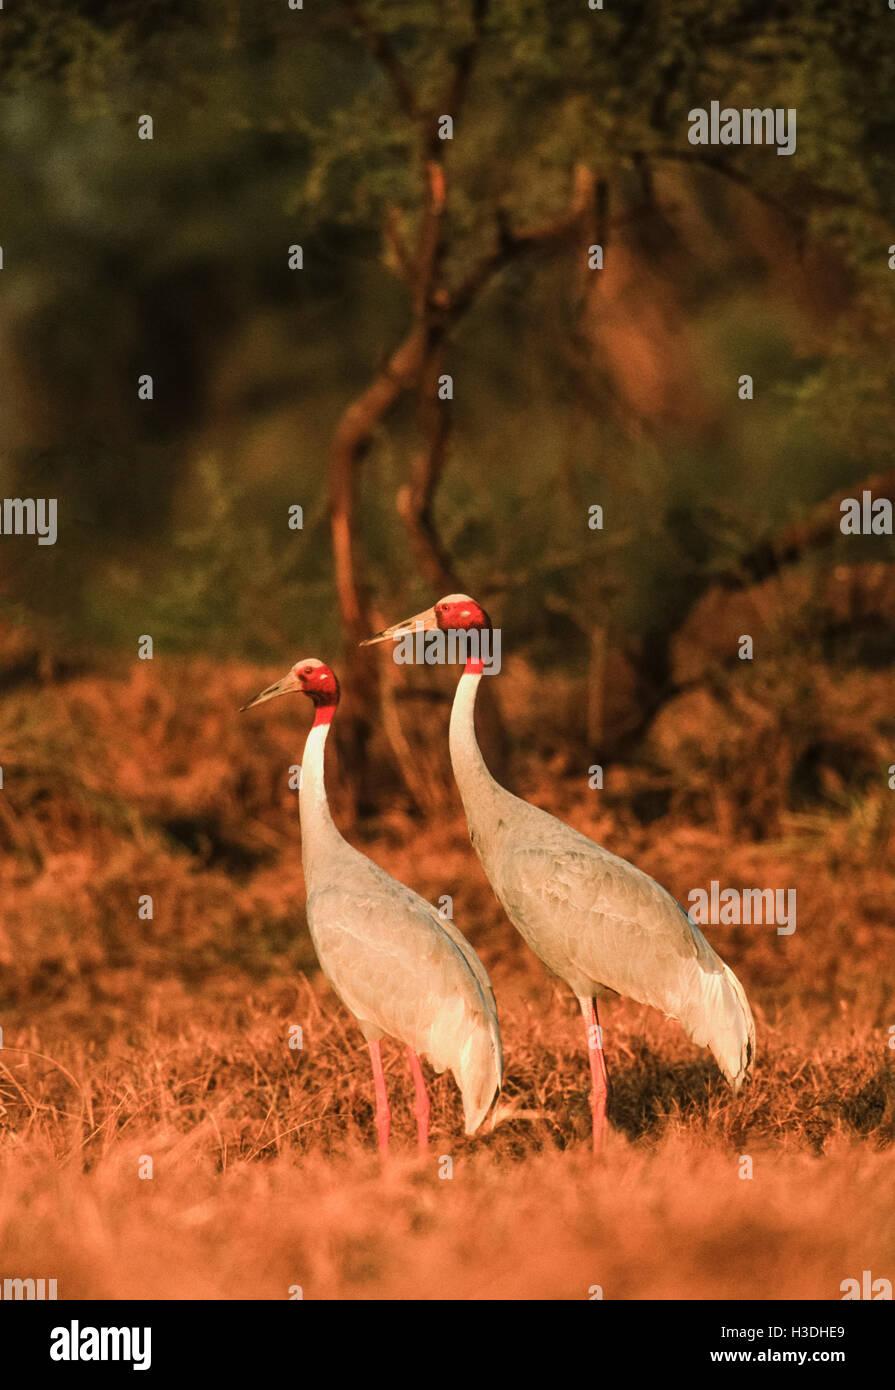 A breeding pair of Sarus Crane,(Grus antigone), at sunset in Keoladeo Ghana National Park, India, Stock Photo